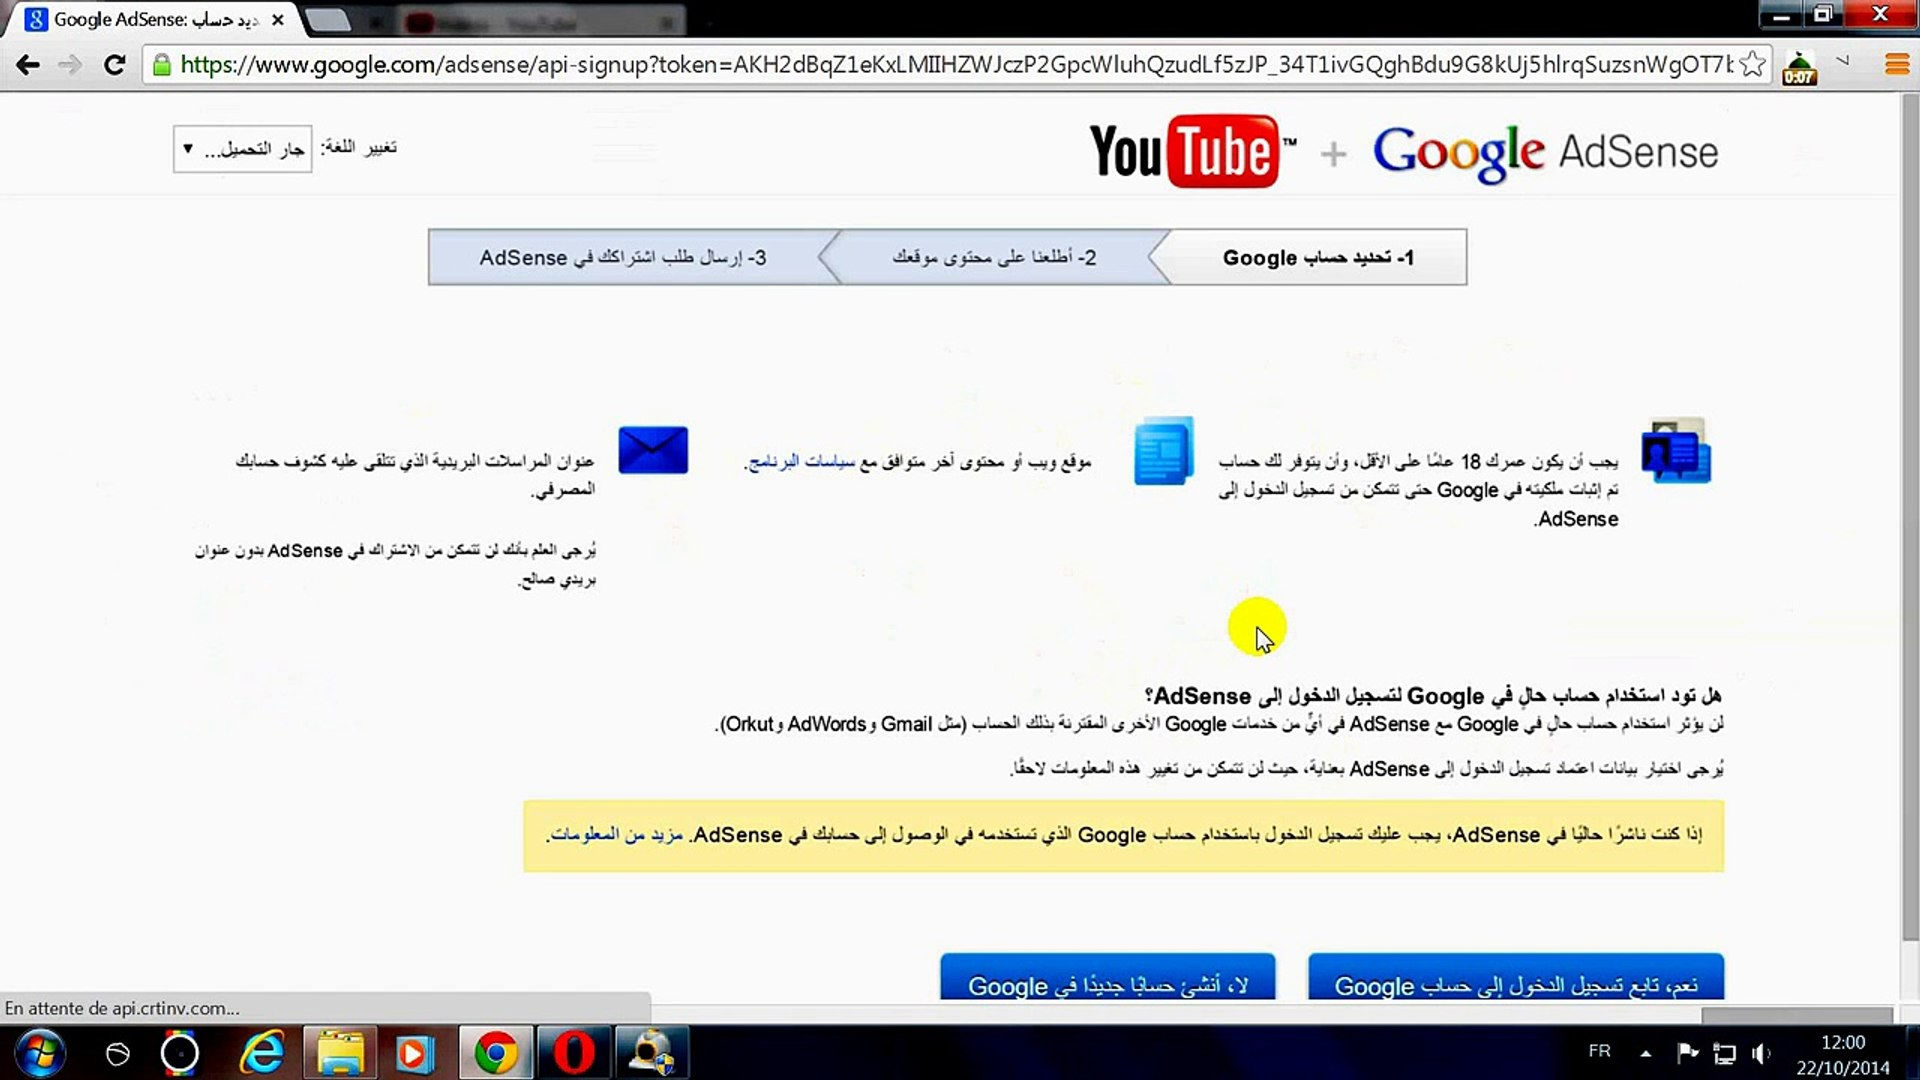 Adsense شرح صوت وفيديوكيفية الربح من اليوتيوب - انشاء حساب جوجل أدسنس وربطه بقنات اليوتيوب22 -10- 14